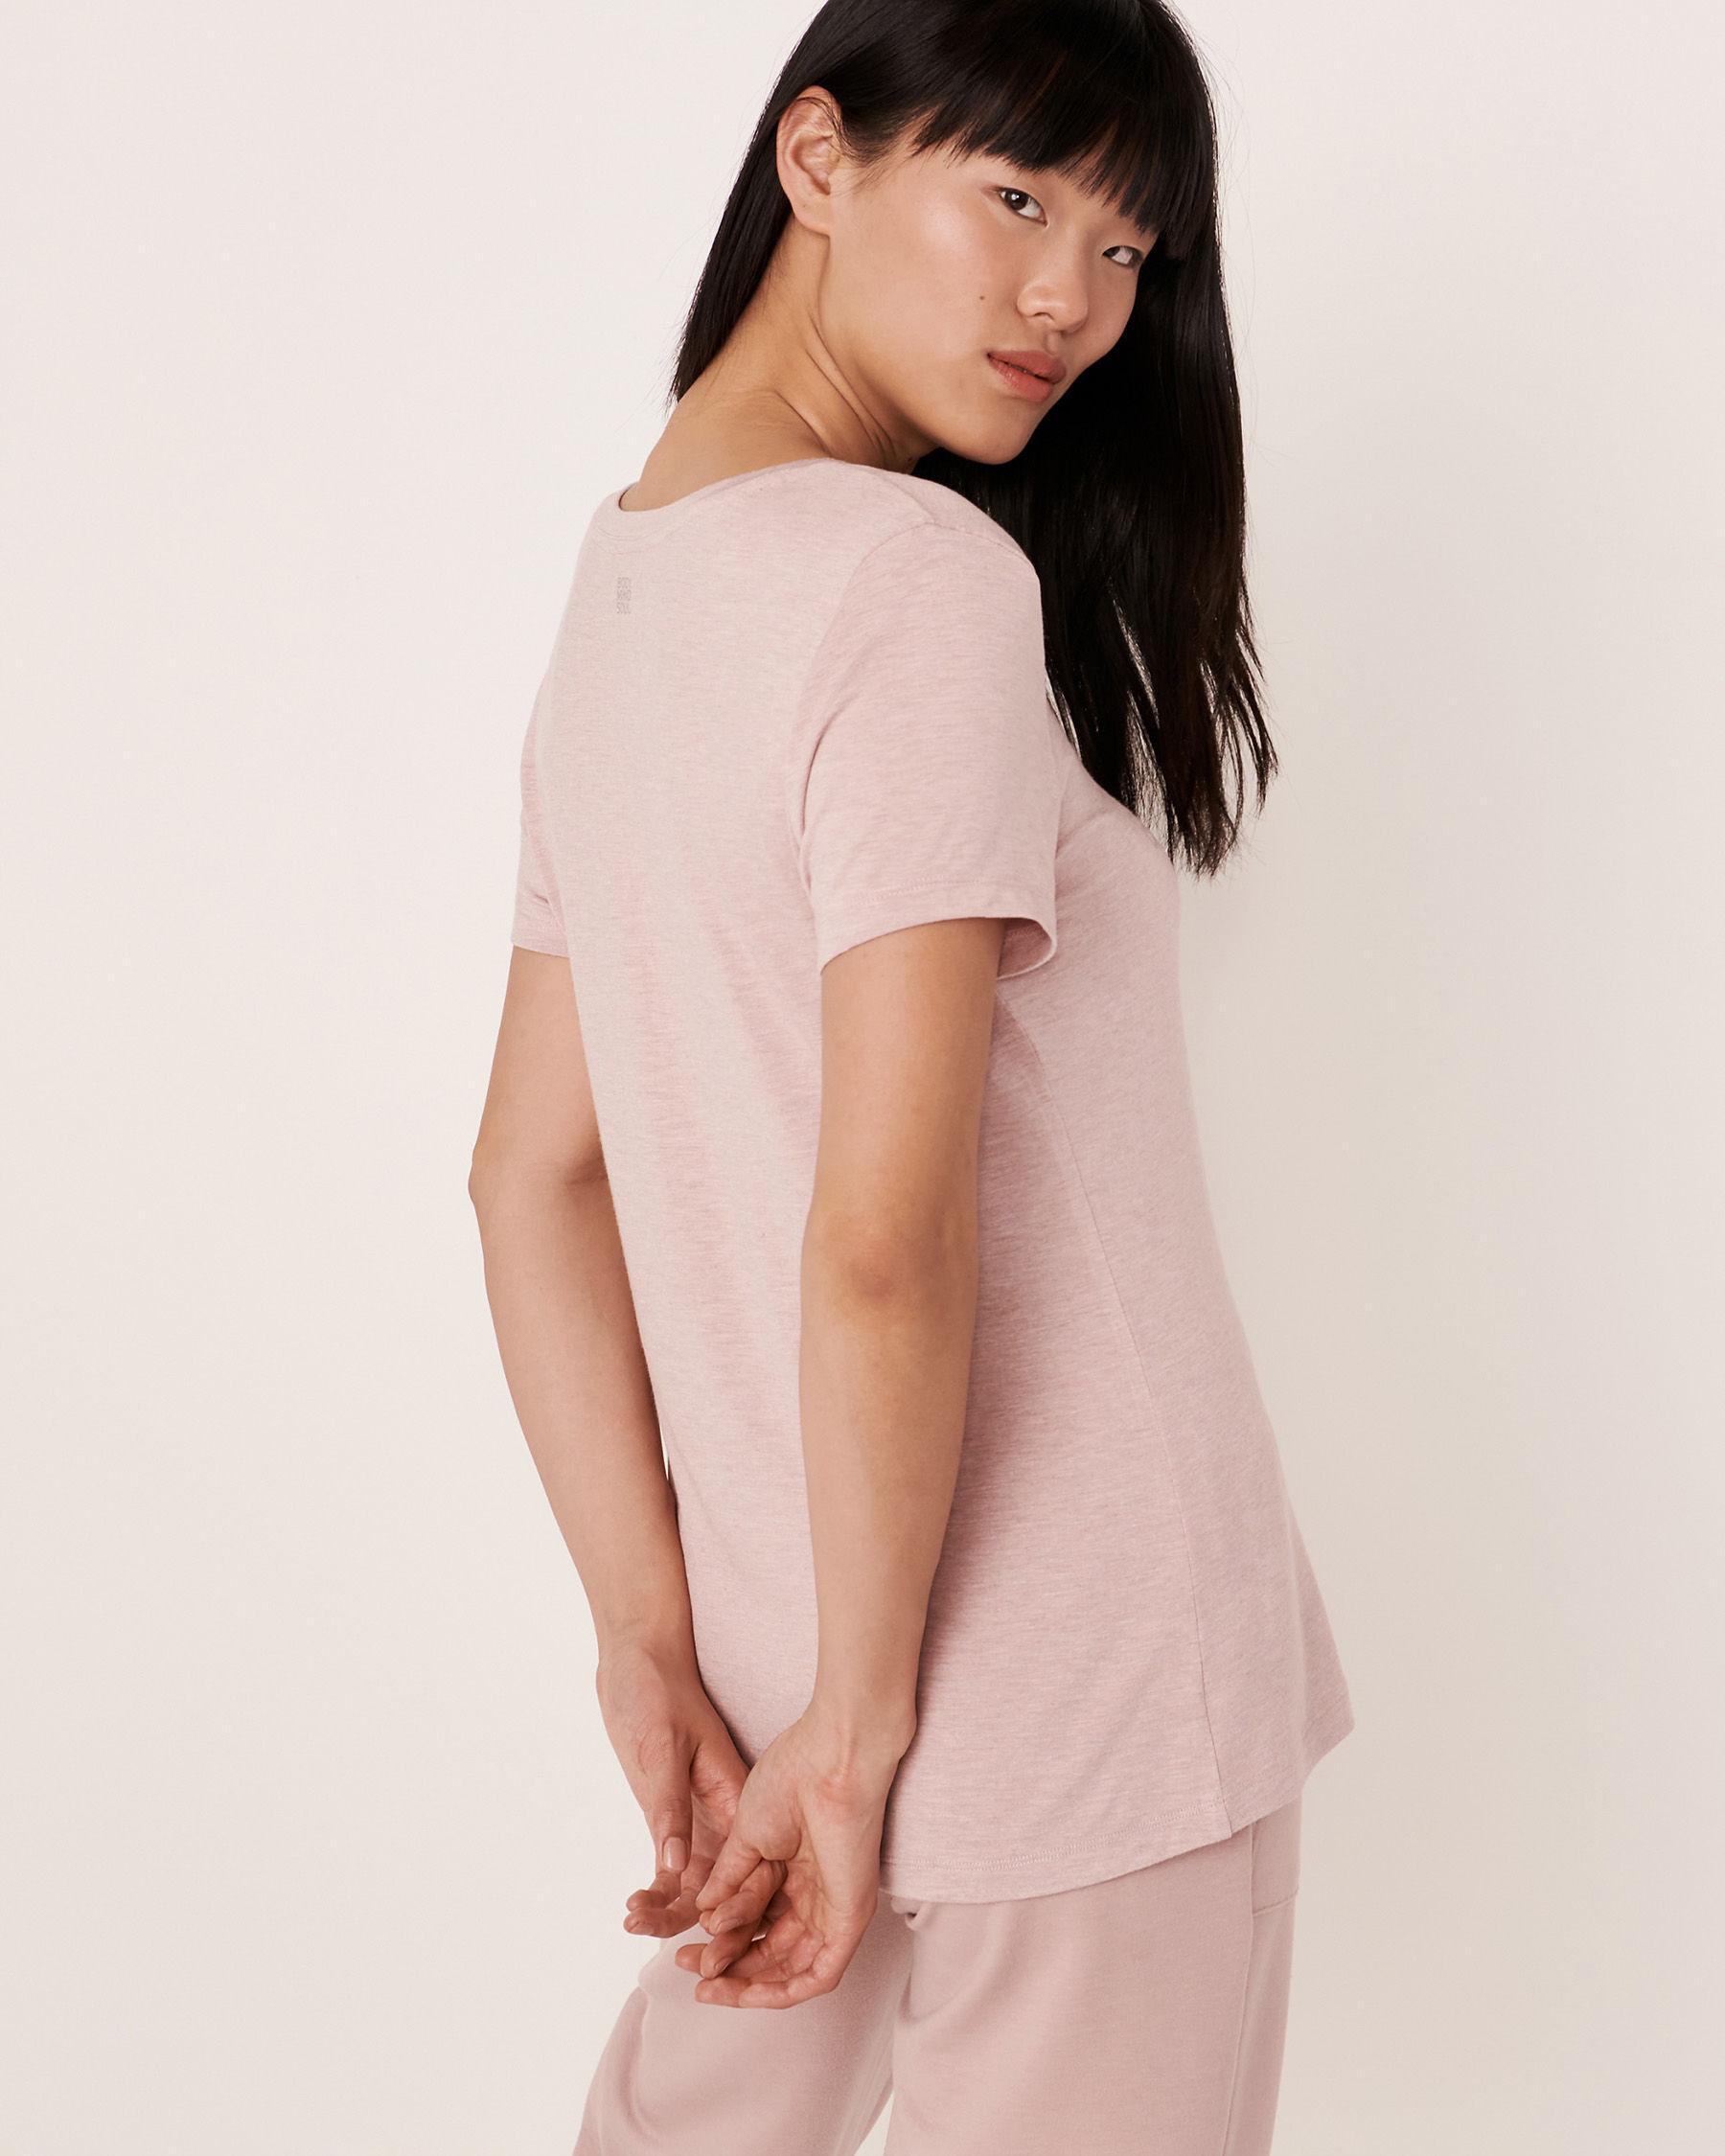 LA VIE EN ROSE Scoop Neck T-shirt Shadow grey 50100014 - View3